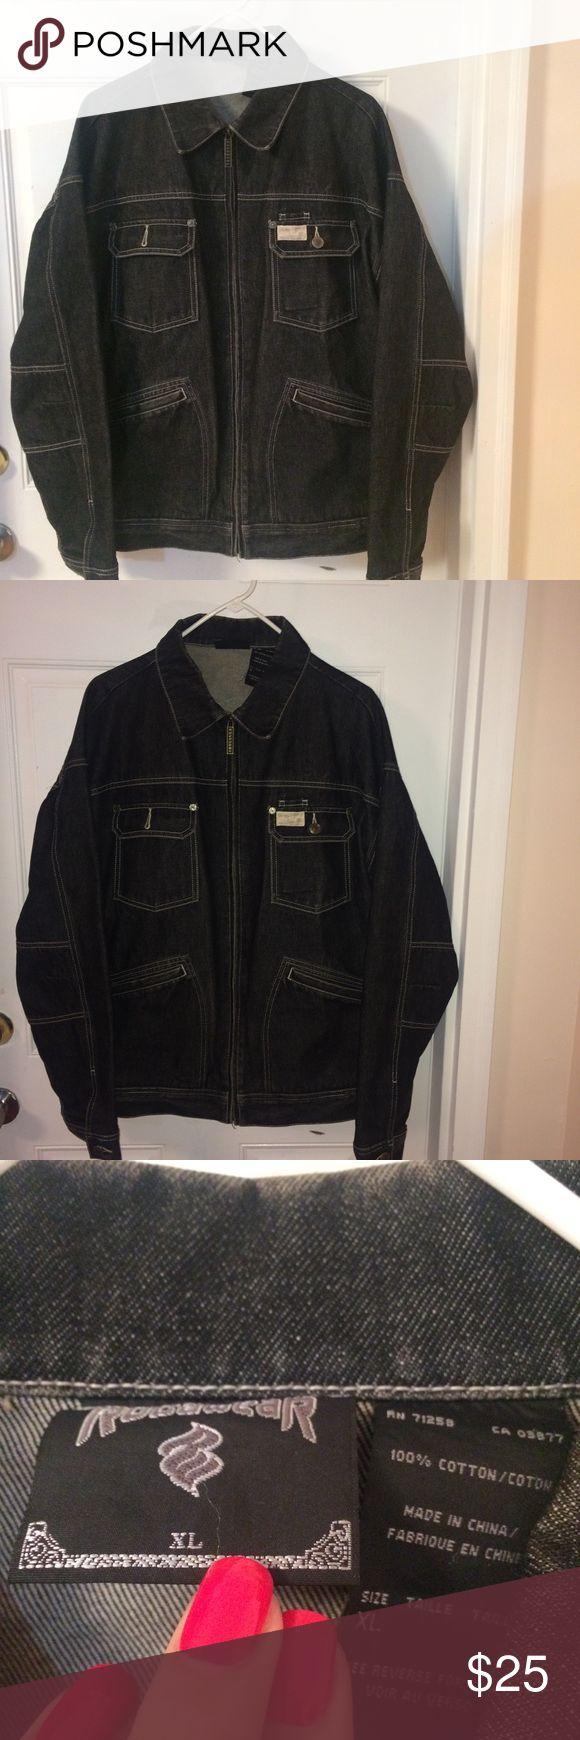 Rocksway men's Jean Jacket XL Jackets & Coats